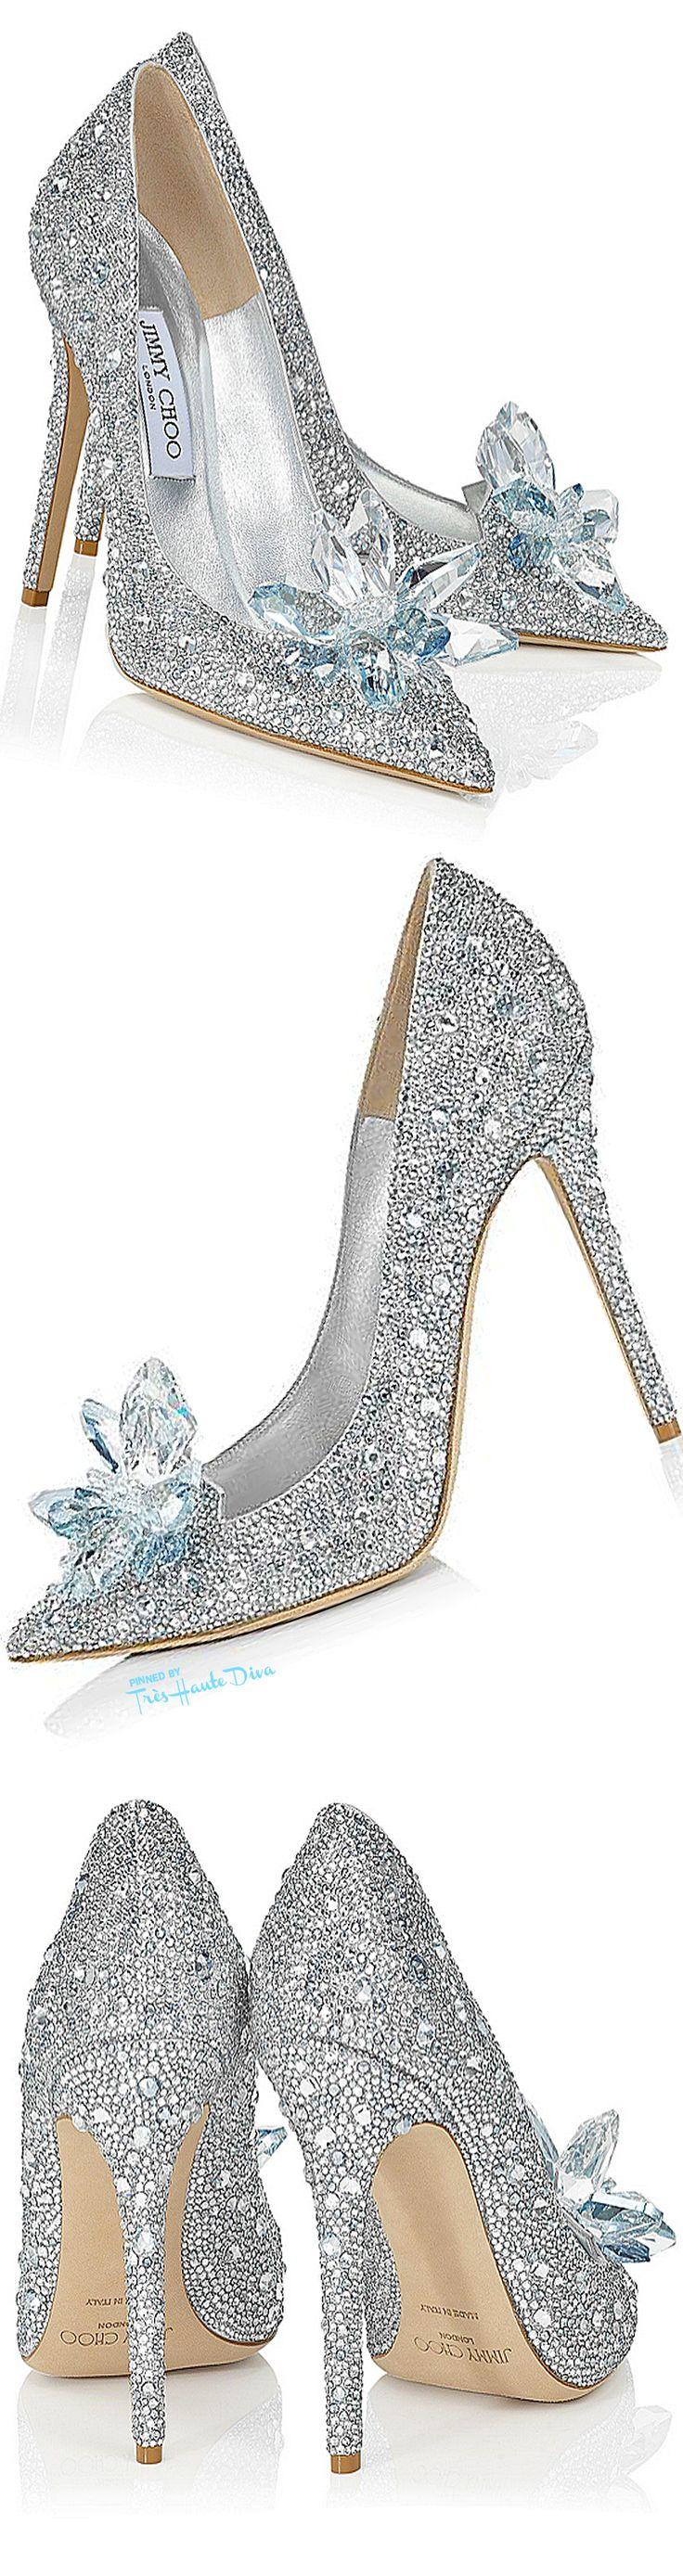 c1f1fbcce3304 Best 25 Cinderella wedding shoes ideas on Pinterest